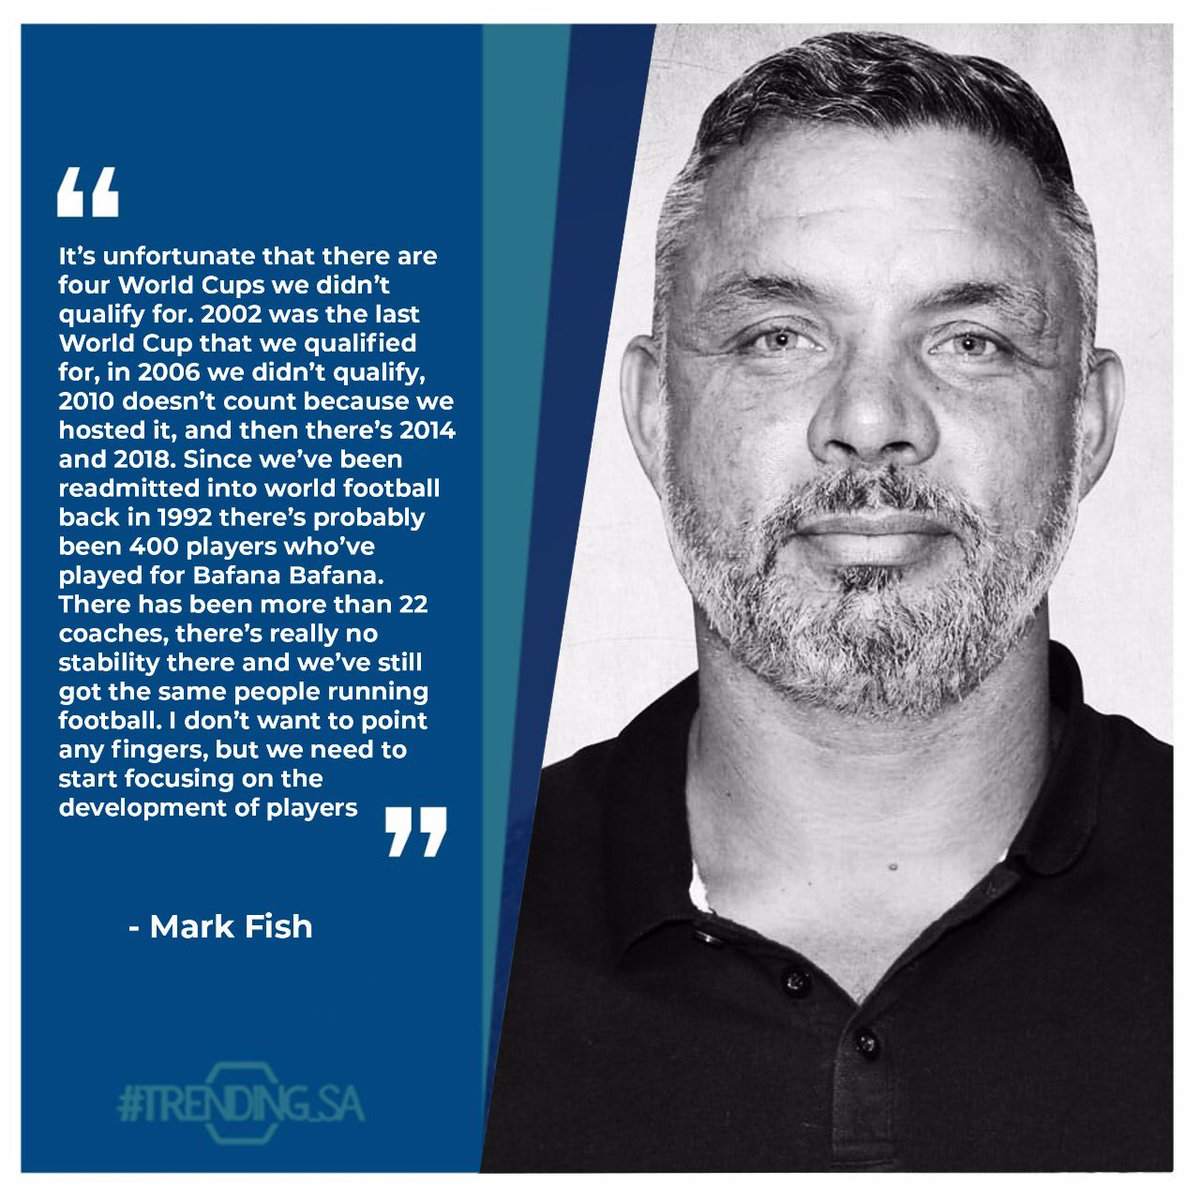 Soccer legend Mark Fish on his opinions about Bafana Bafana. #tsaonline #tsaon3